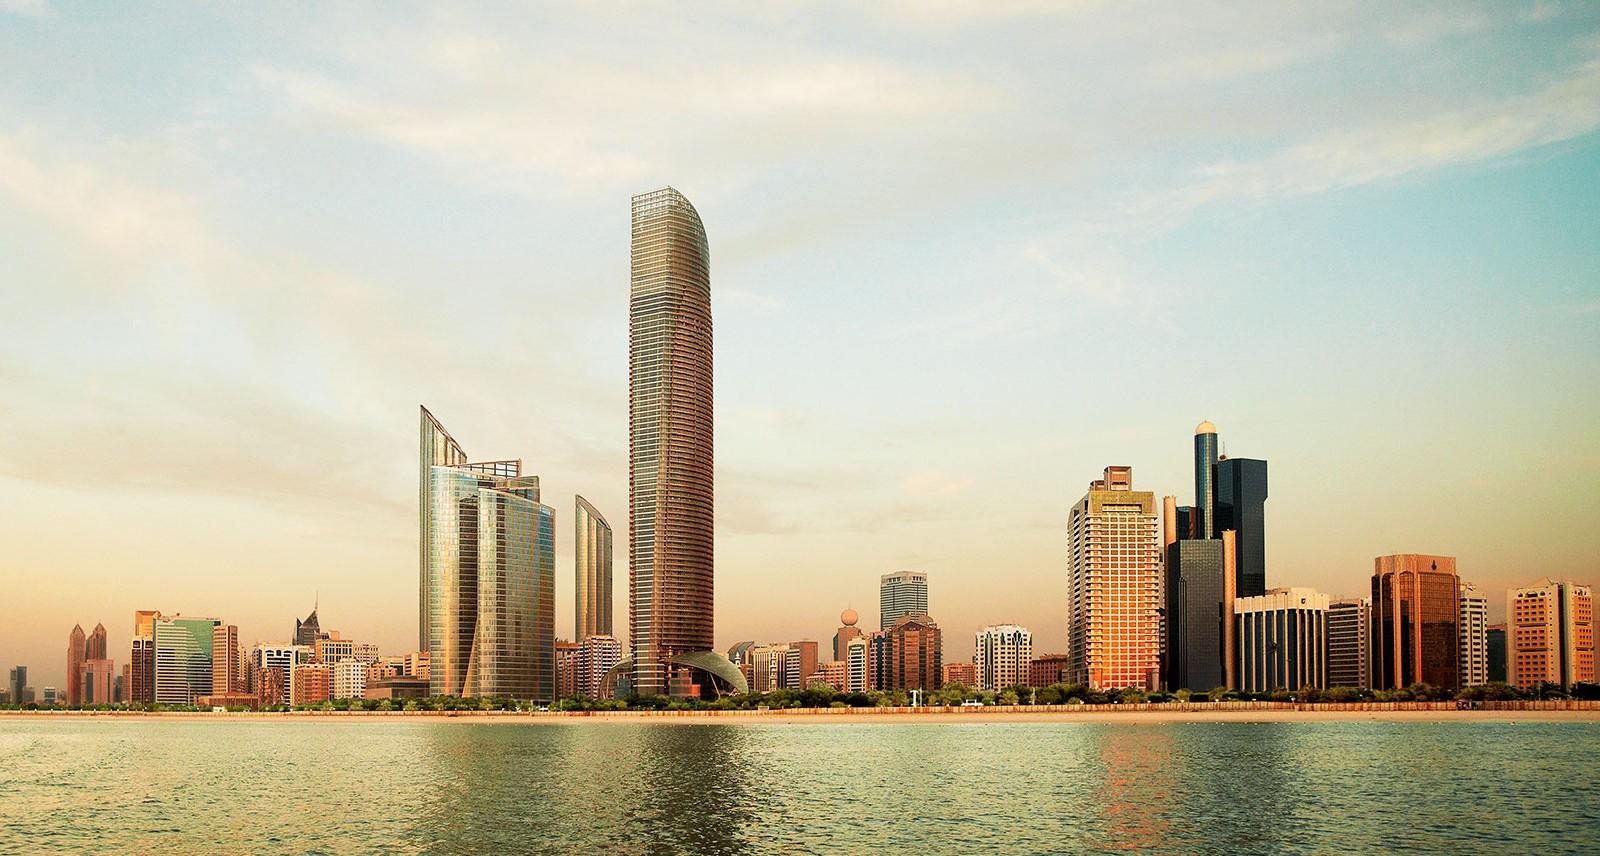 6 Reasons to Make Abu Dhabi Your Next Destination